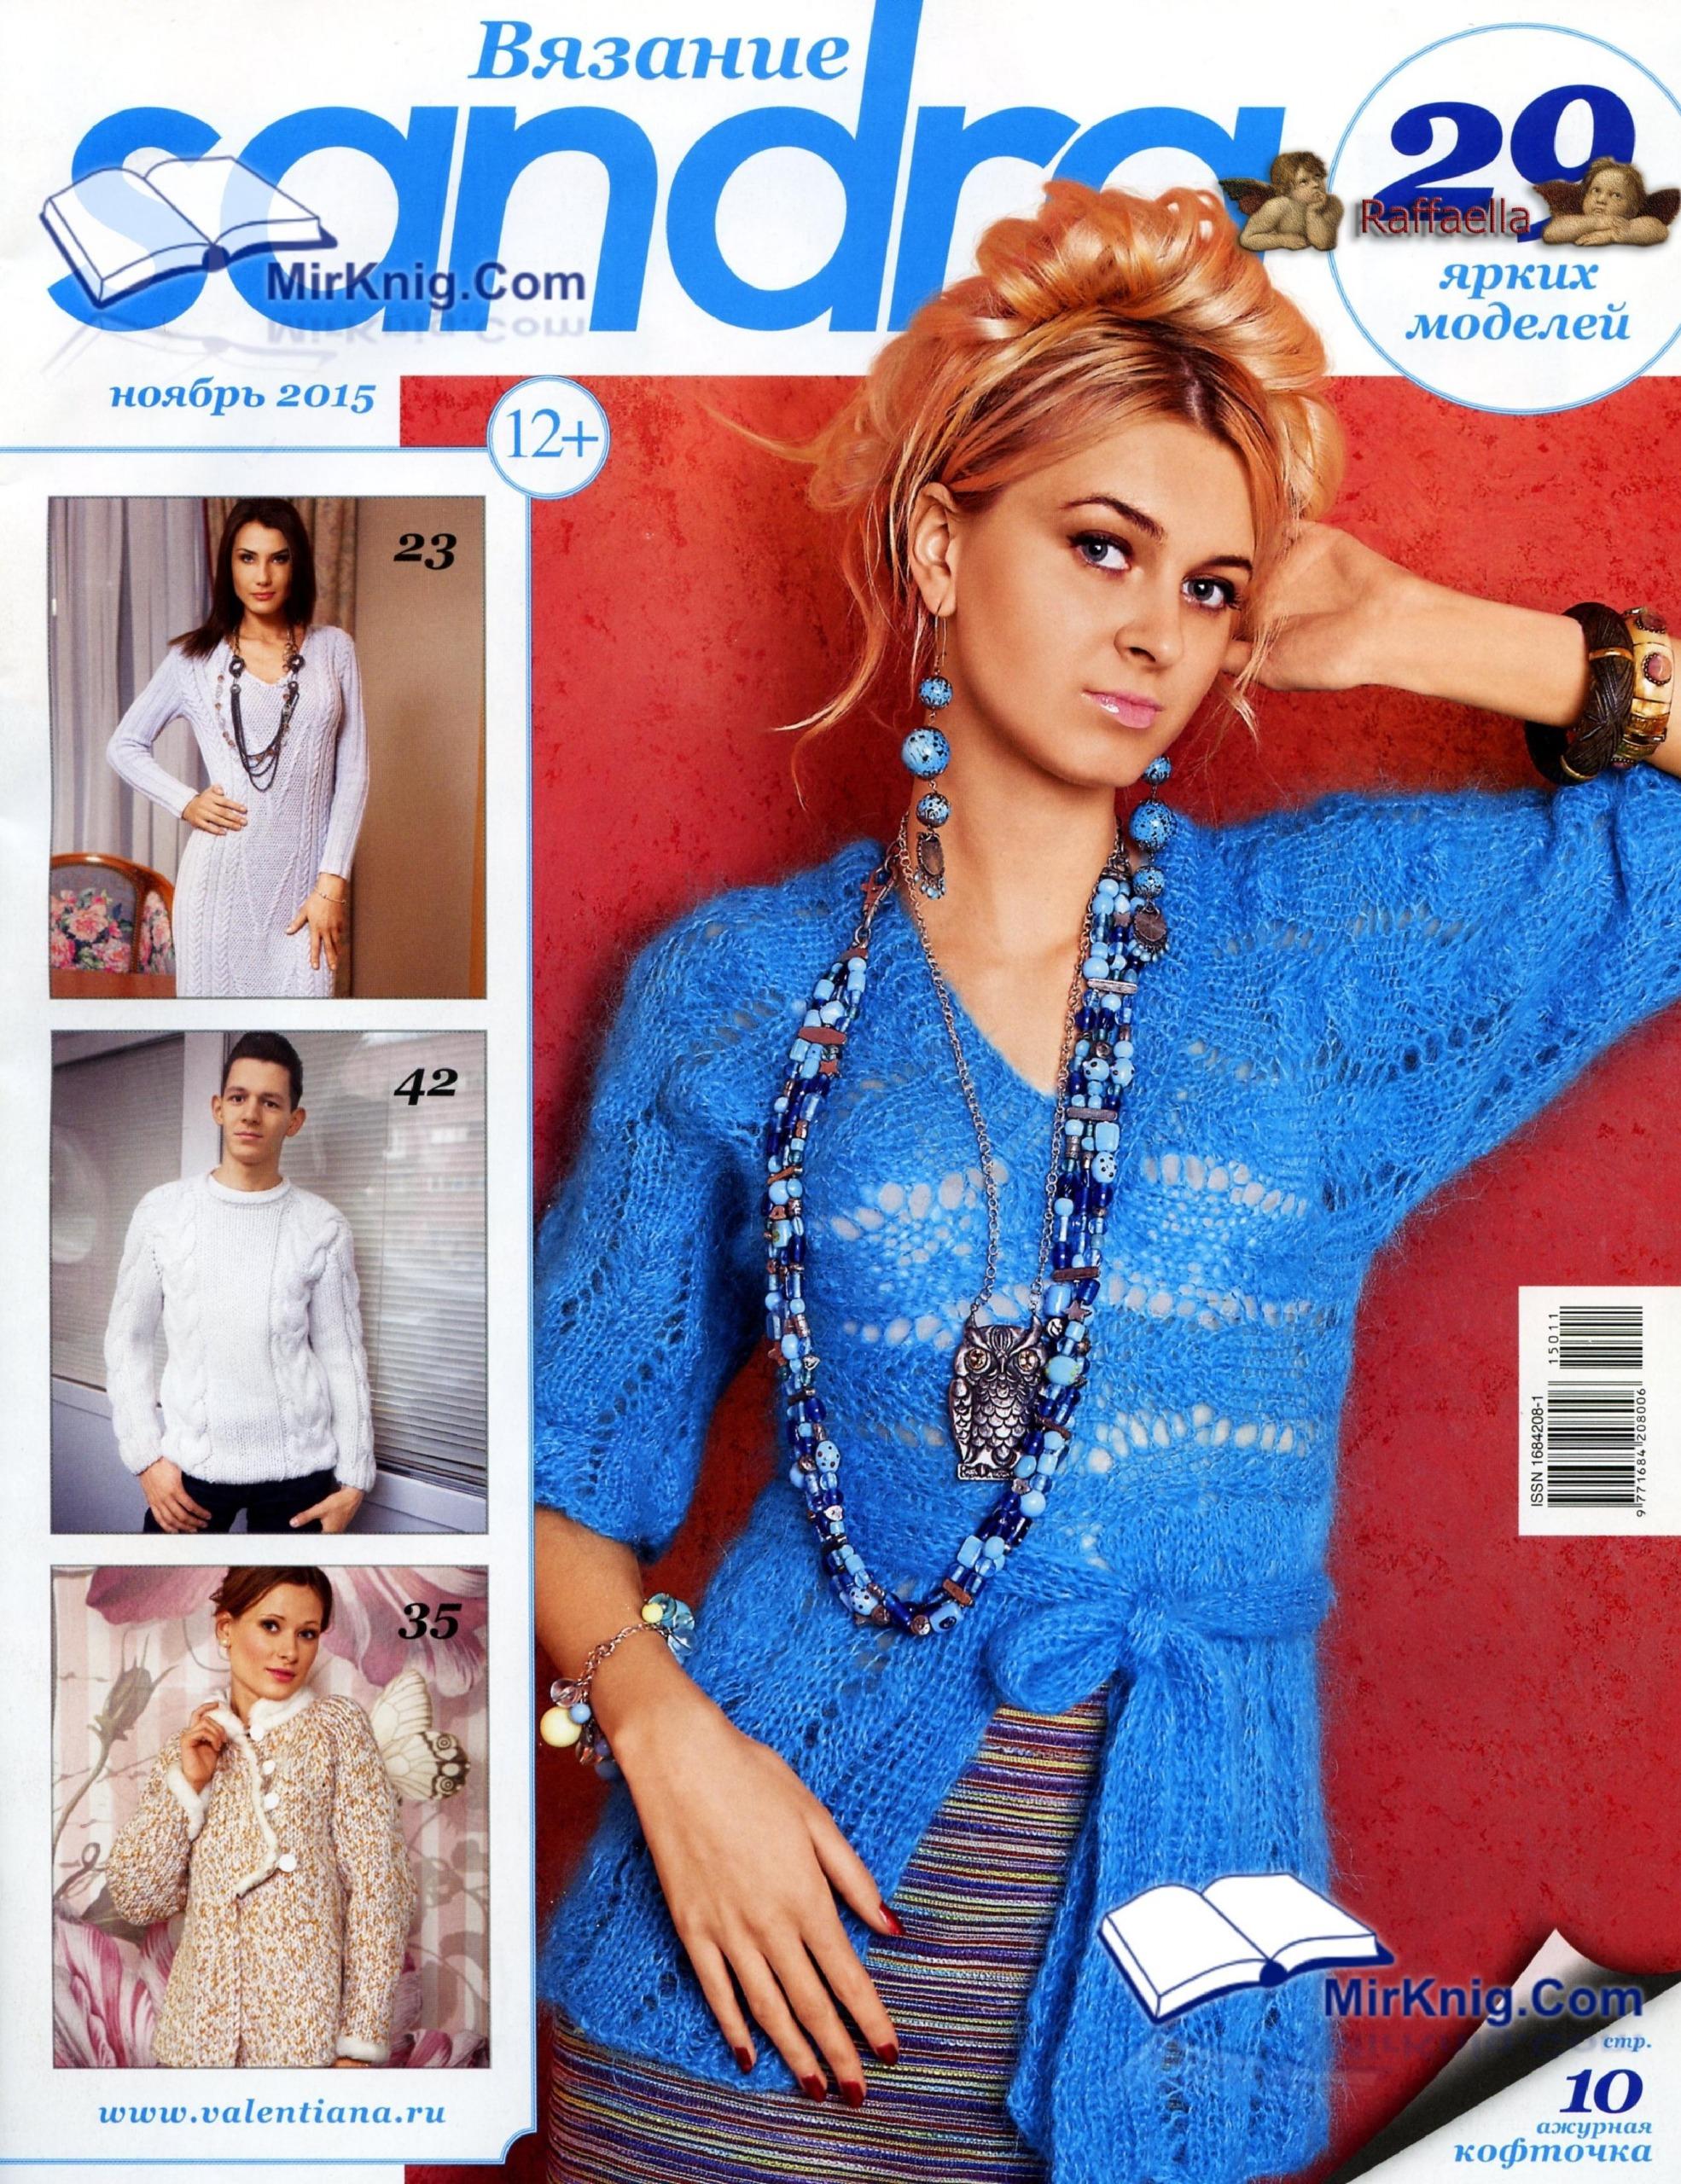 сандра журнал по вязанию спицами фото